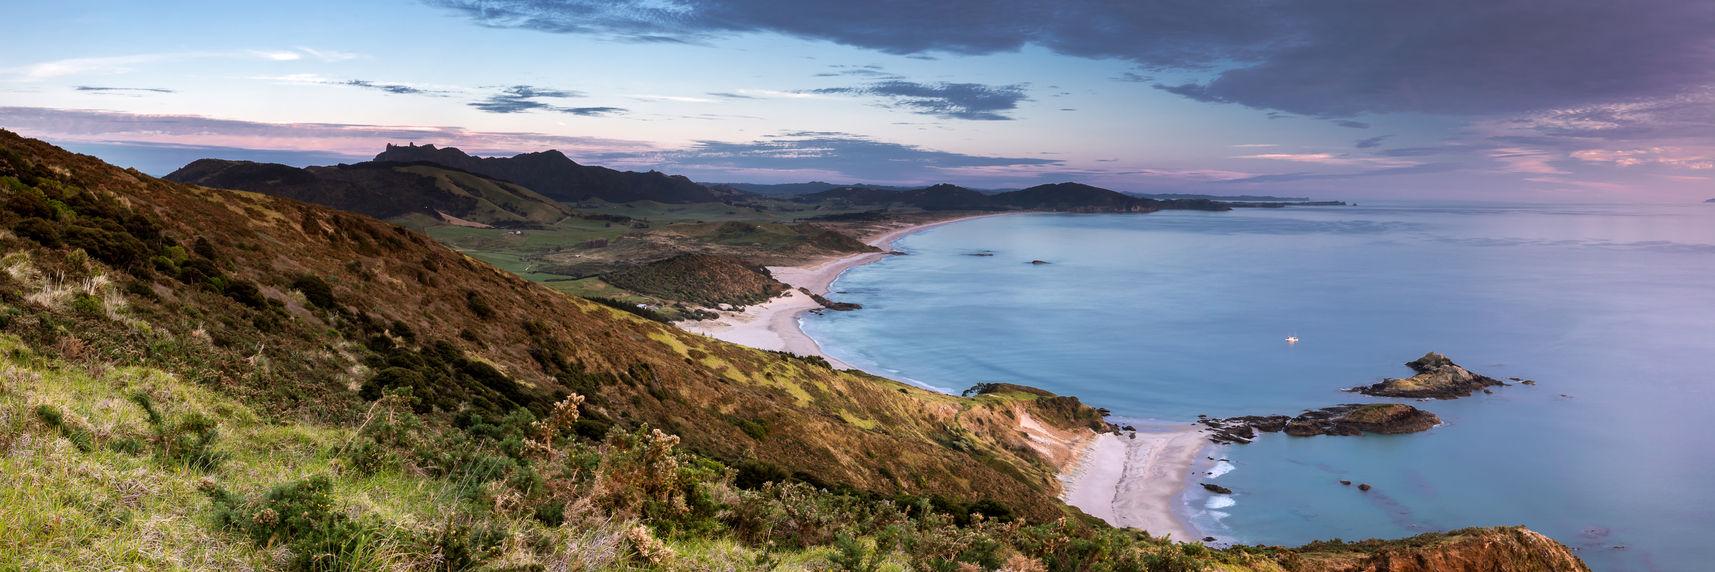 Ocean Beach from Bream Head 5992 EM.jpg